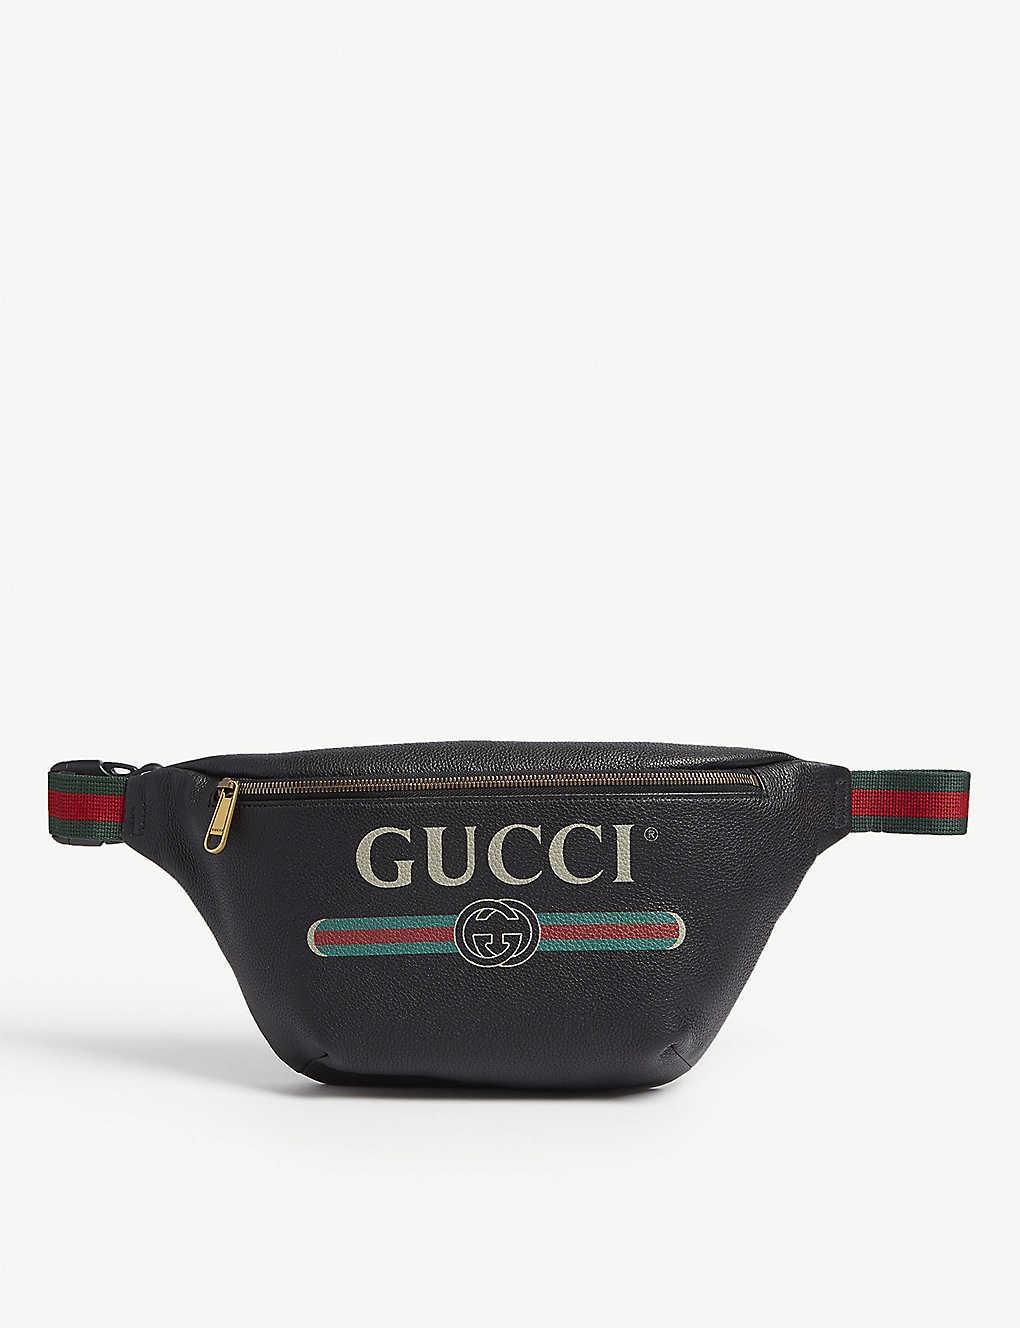 89536a5a3a2b GUCCI - Logo-print small leather belt bag | Selfridges.com